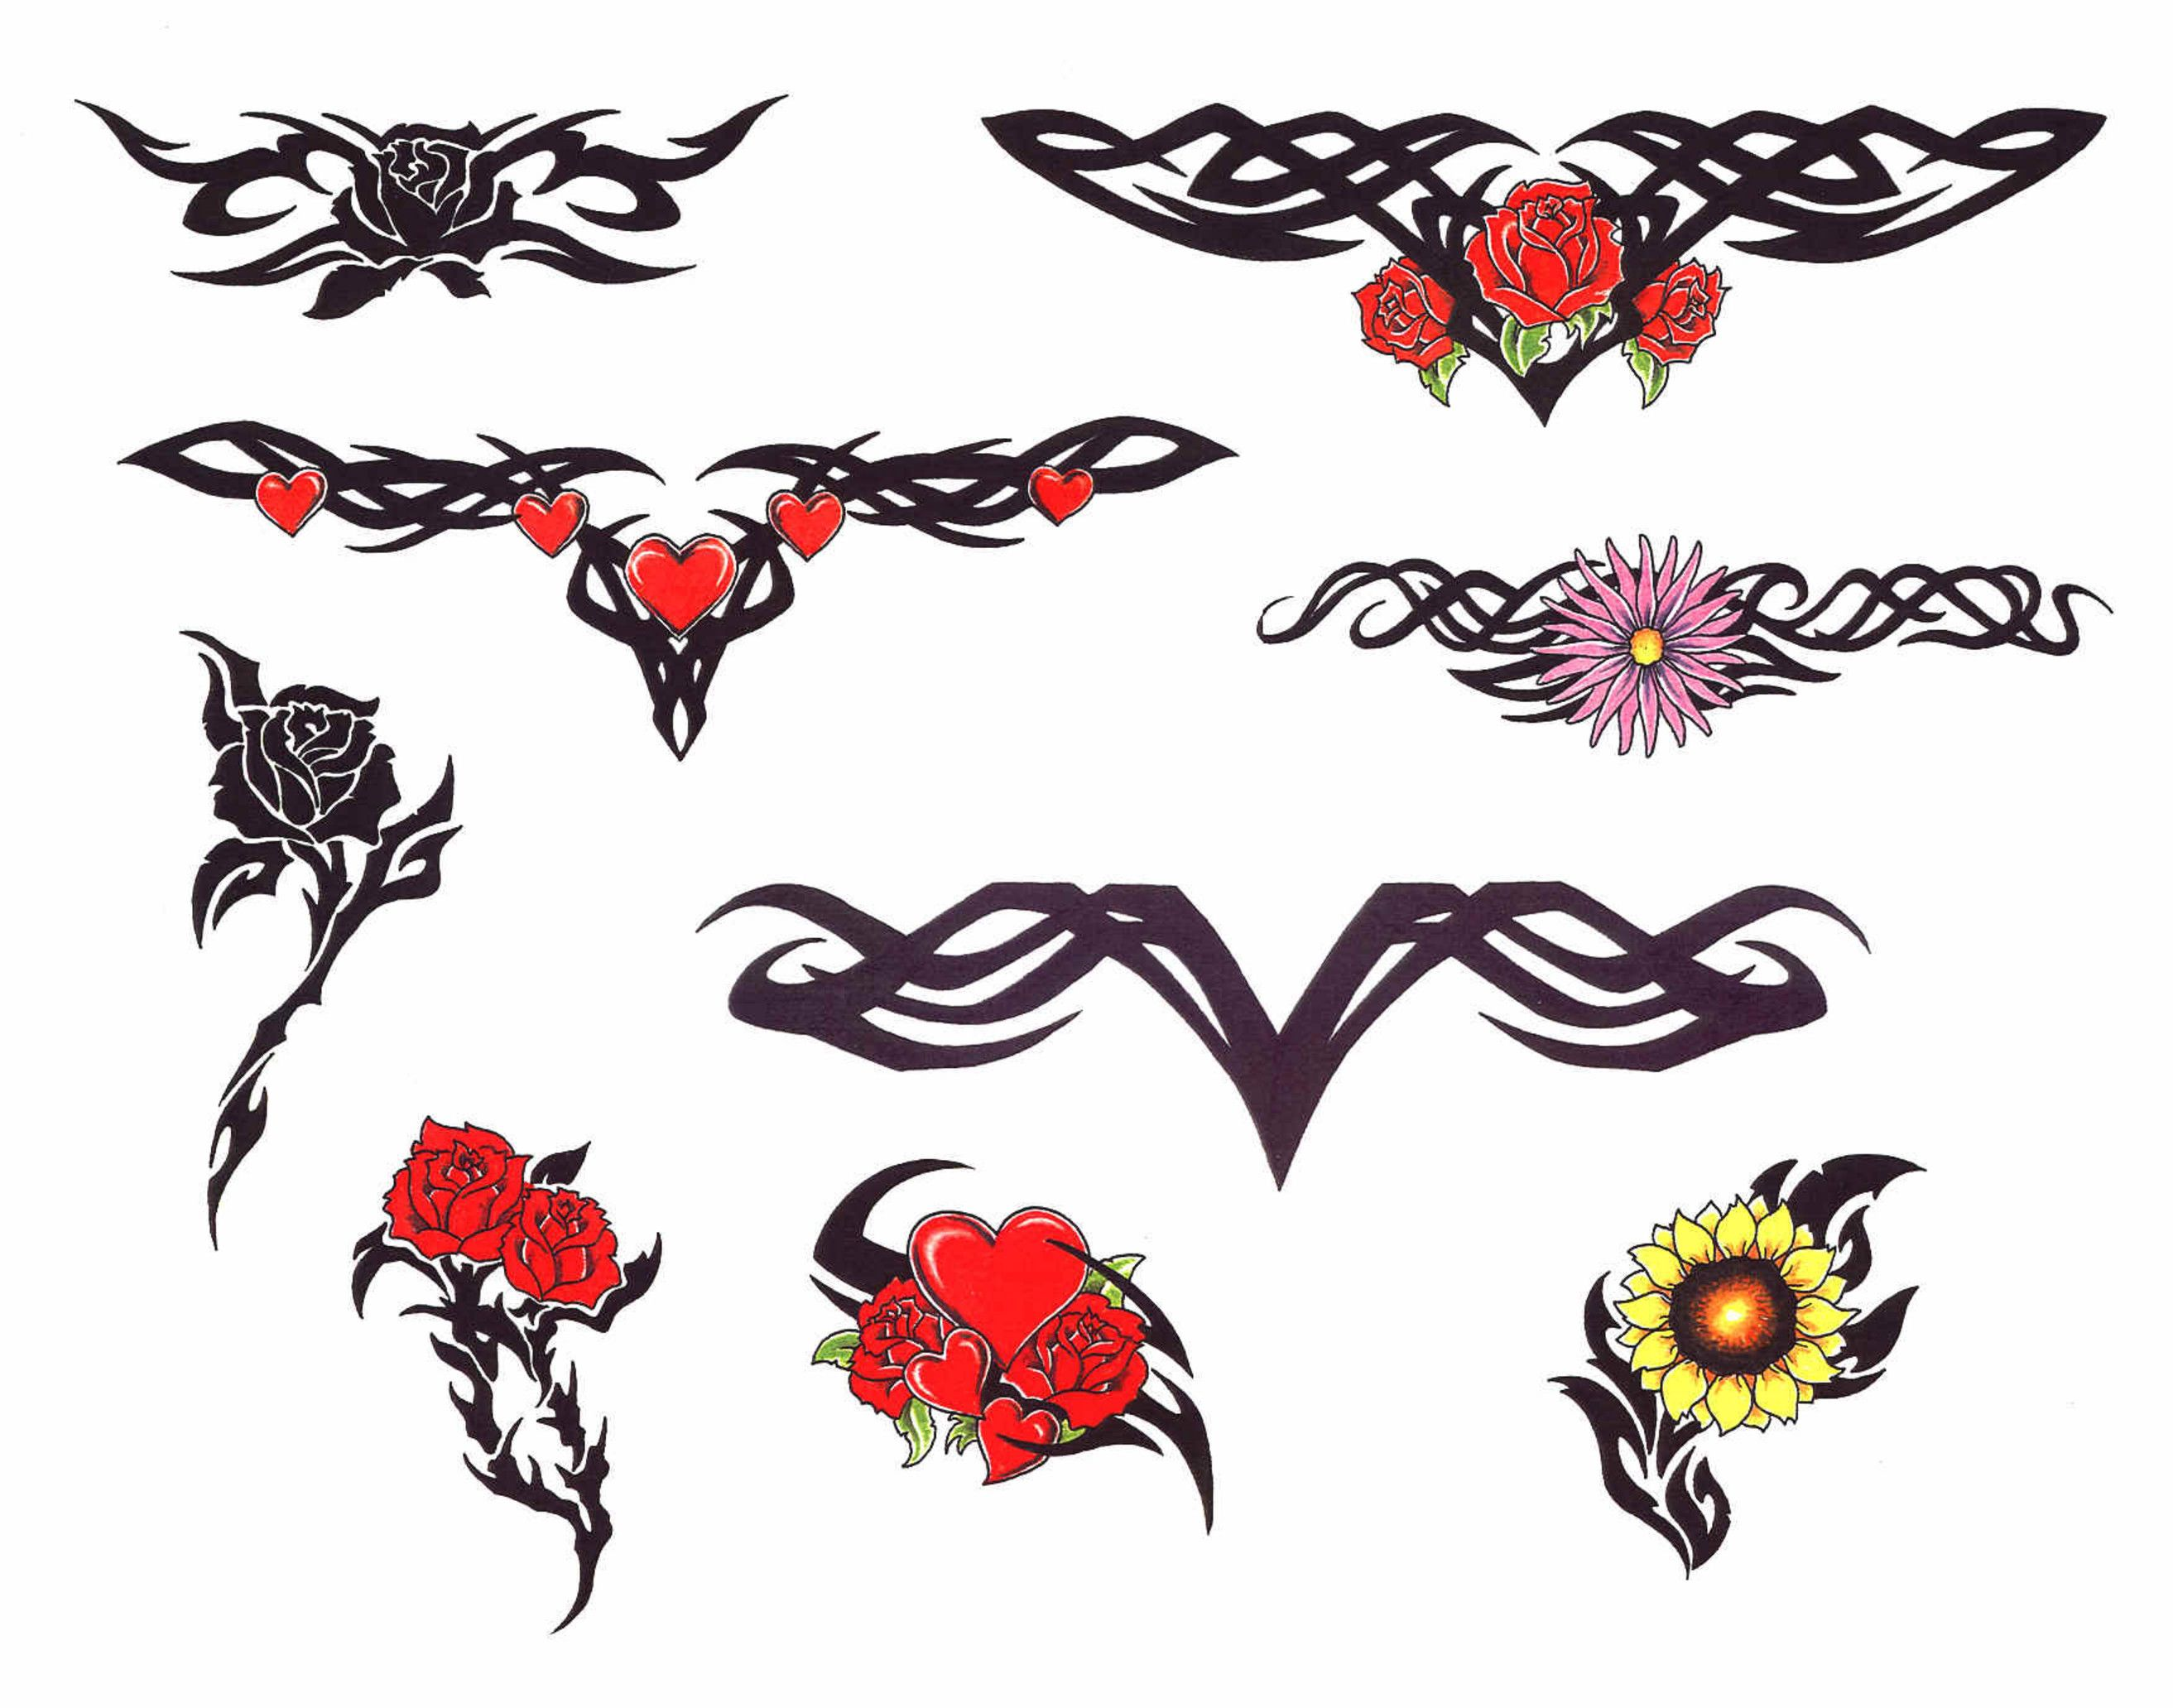 Free tattoo designs freetattoodesigns2151840007